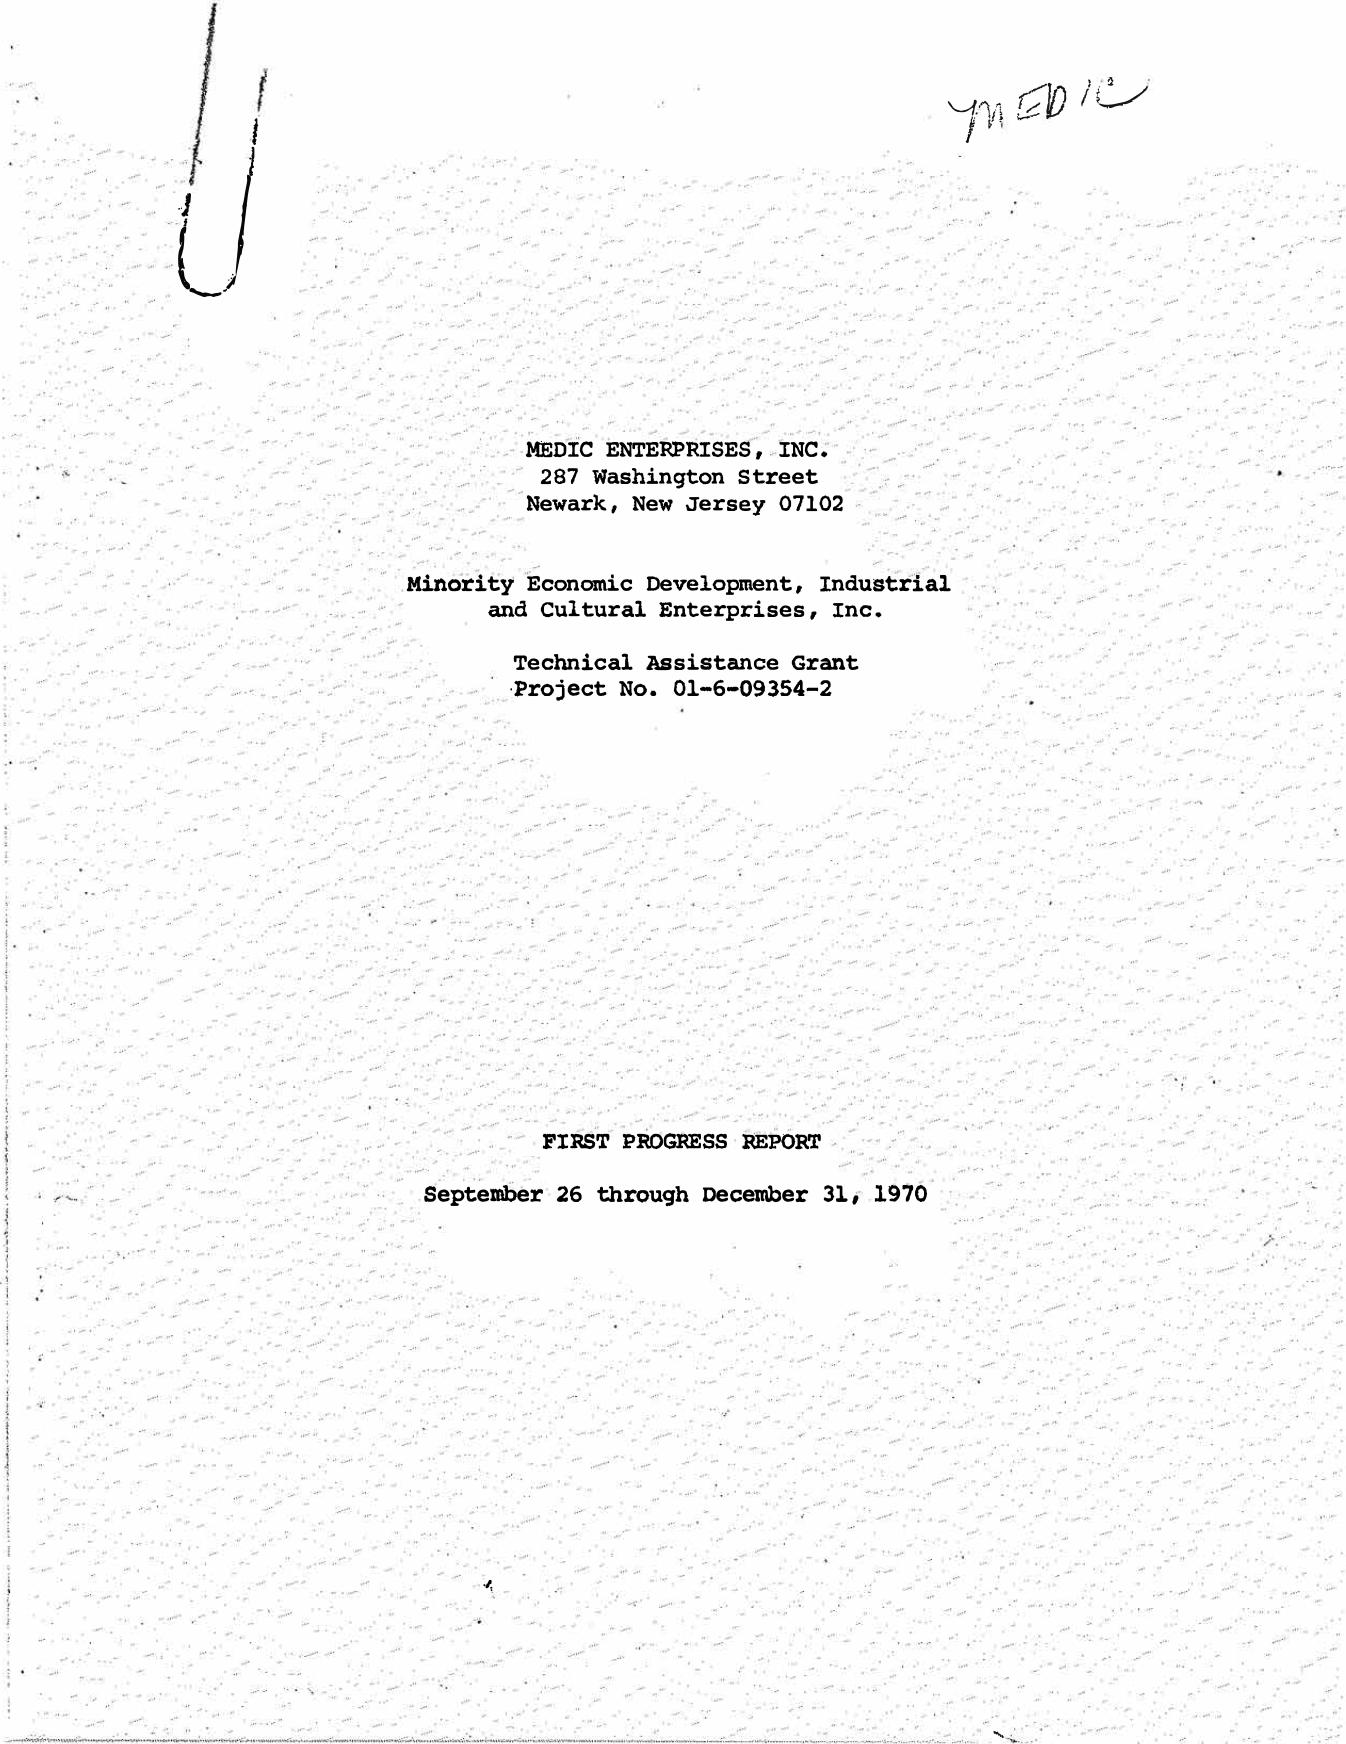 MEDIC First Progress Report (1970)